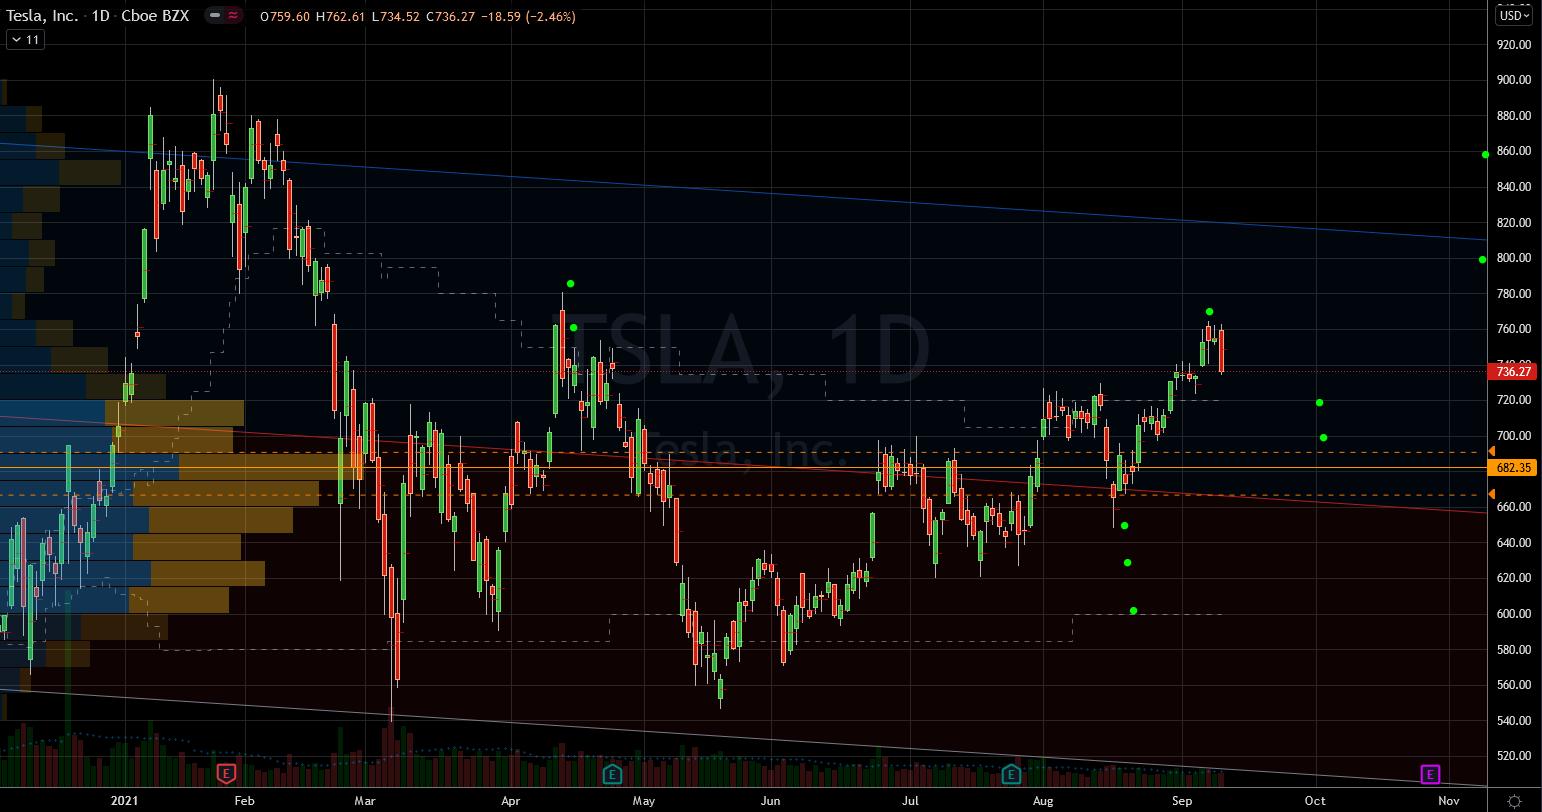 Tesla (TSLA) Stock Chart Showing Ascending Trend